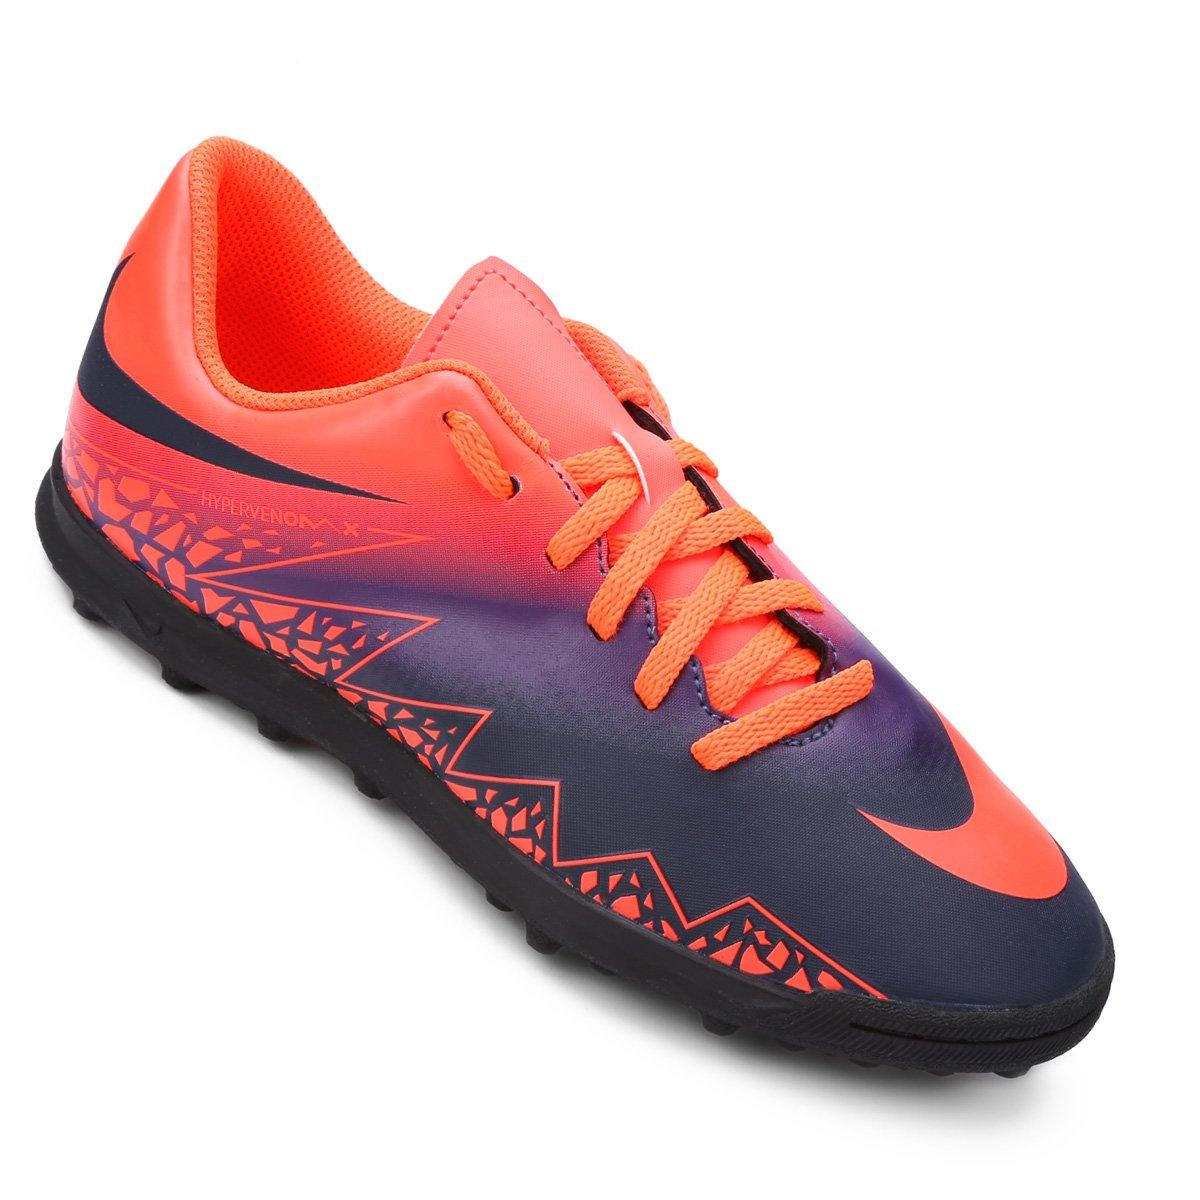 f2921e2b00716 ... hot chuteira society infantil nike hypervenom phade 2 tf compre agora  netshoes c6102 a6059